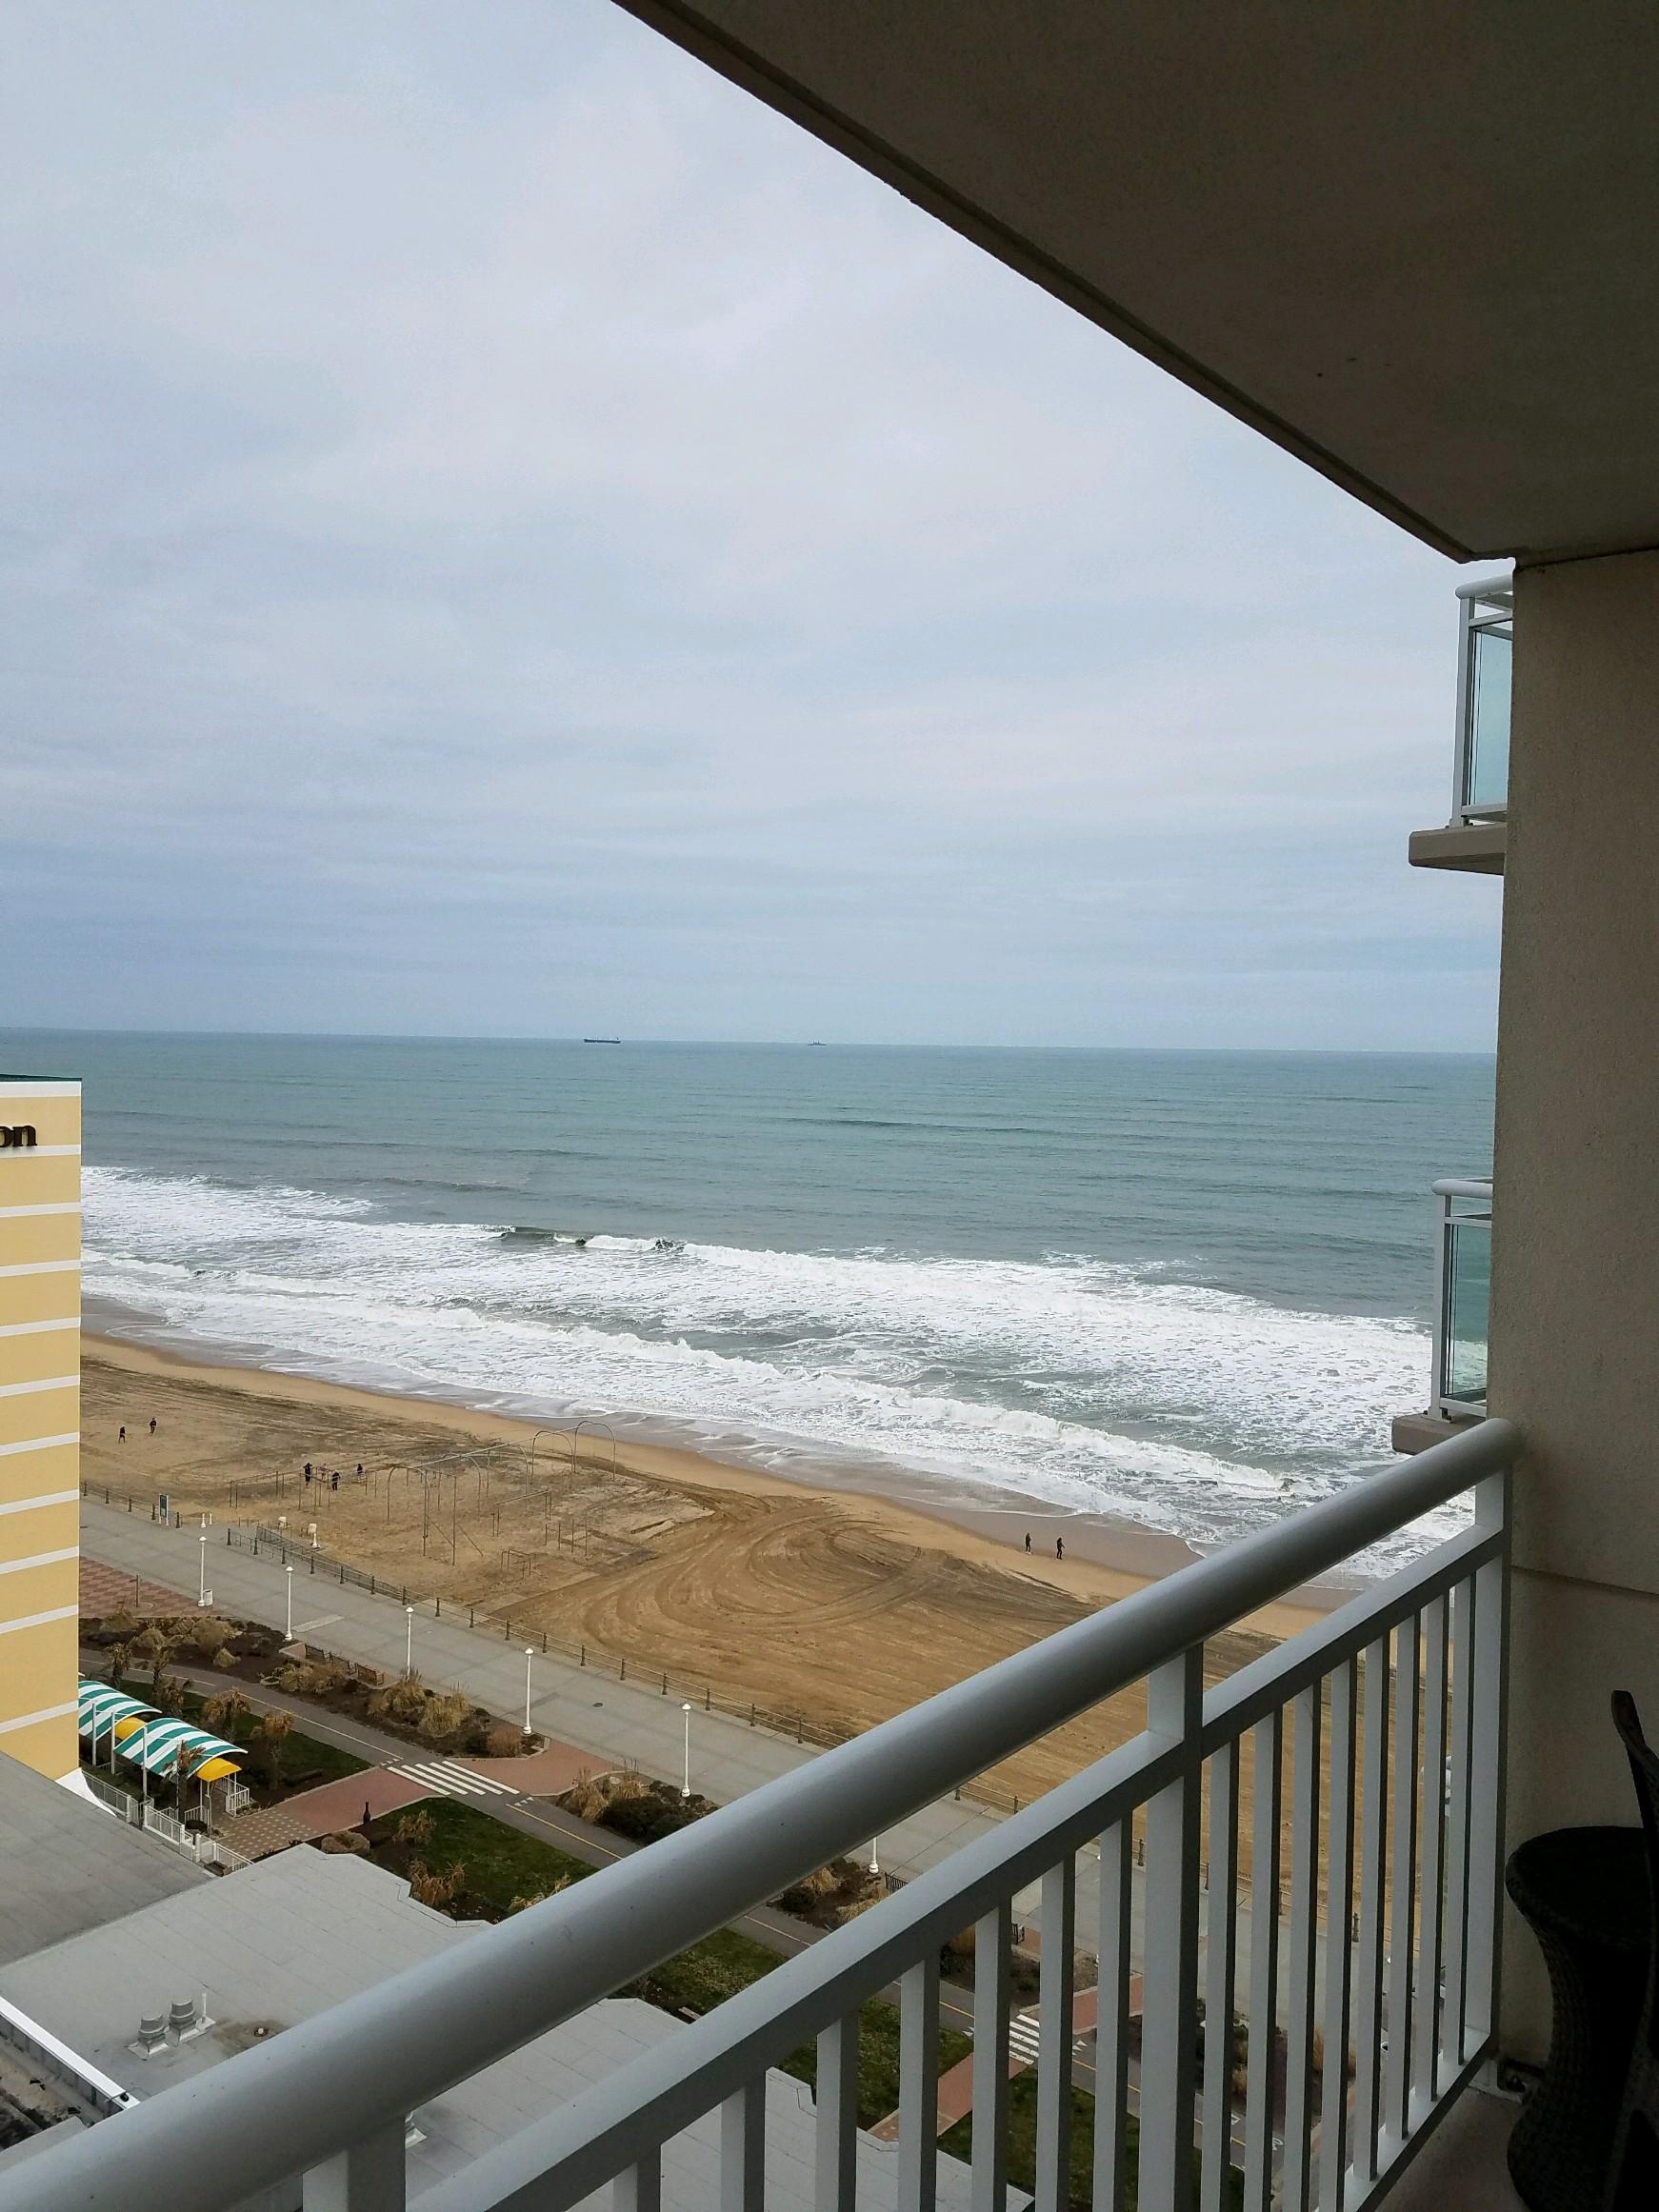 Hitting Up Virginia Beach, VA Early in the Season Makes